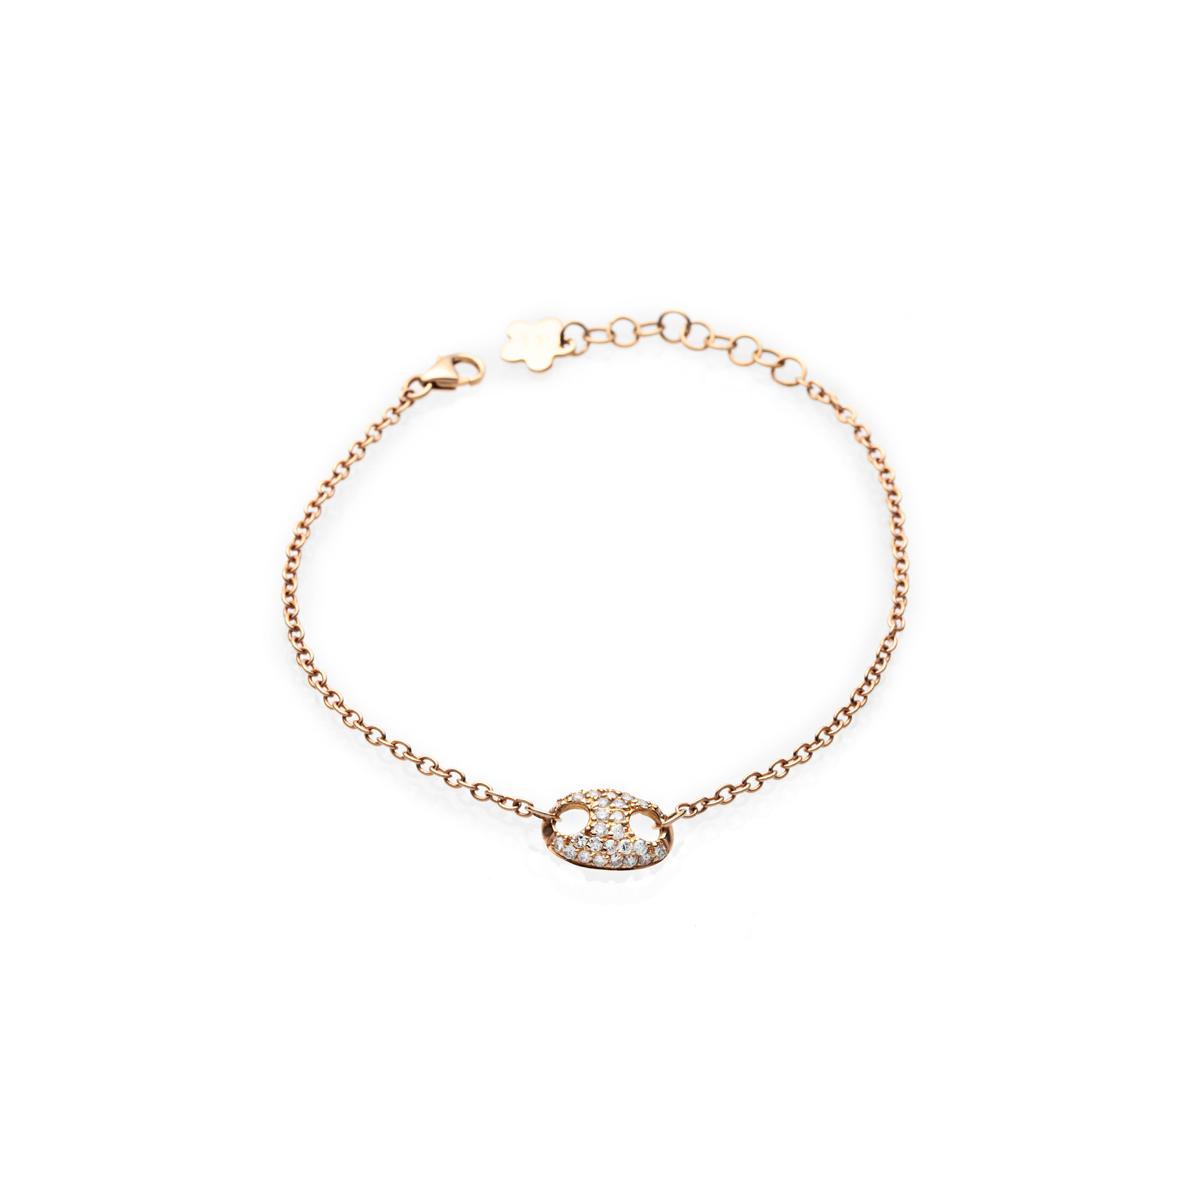 Adjustable 18Kt Gold Chain Bracelet with Diamonds